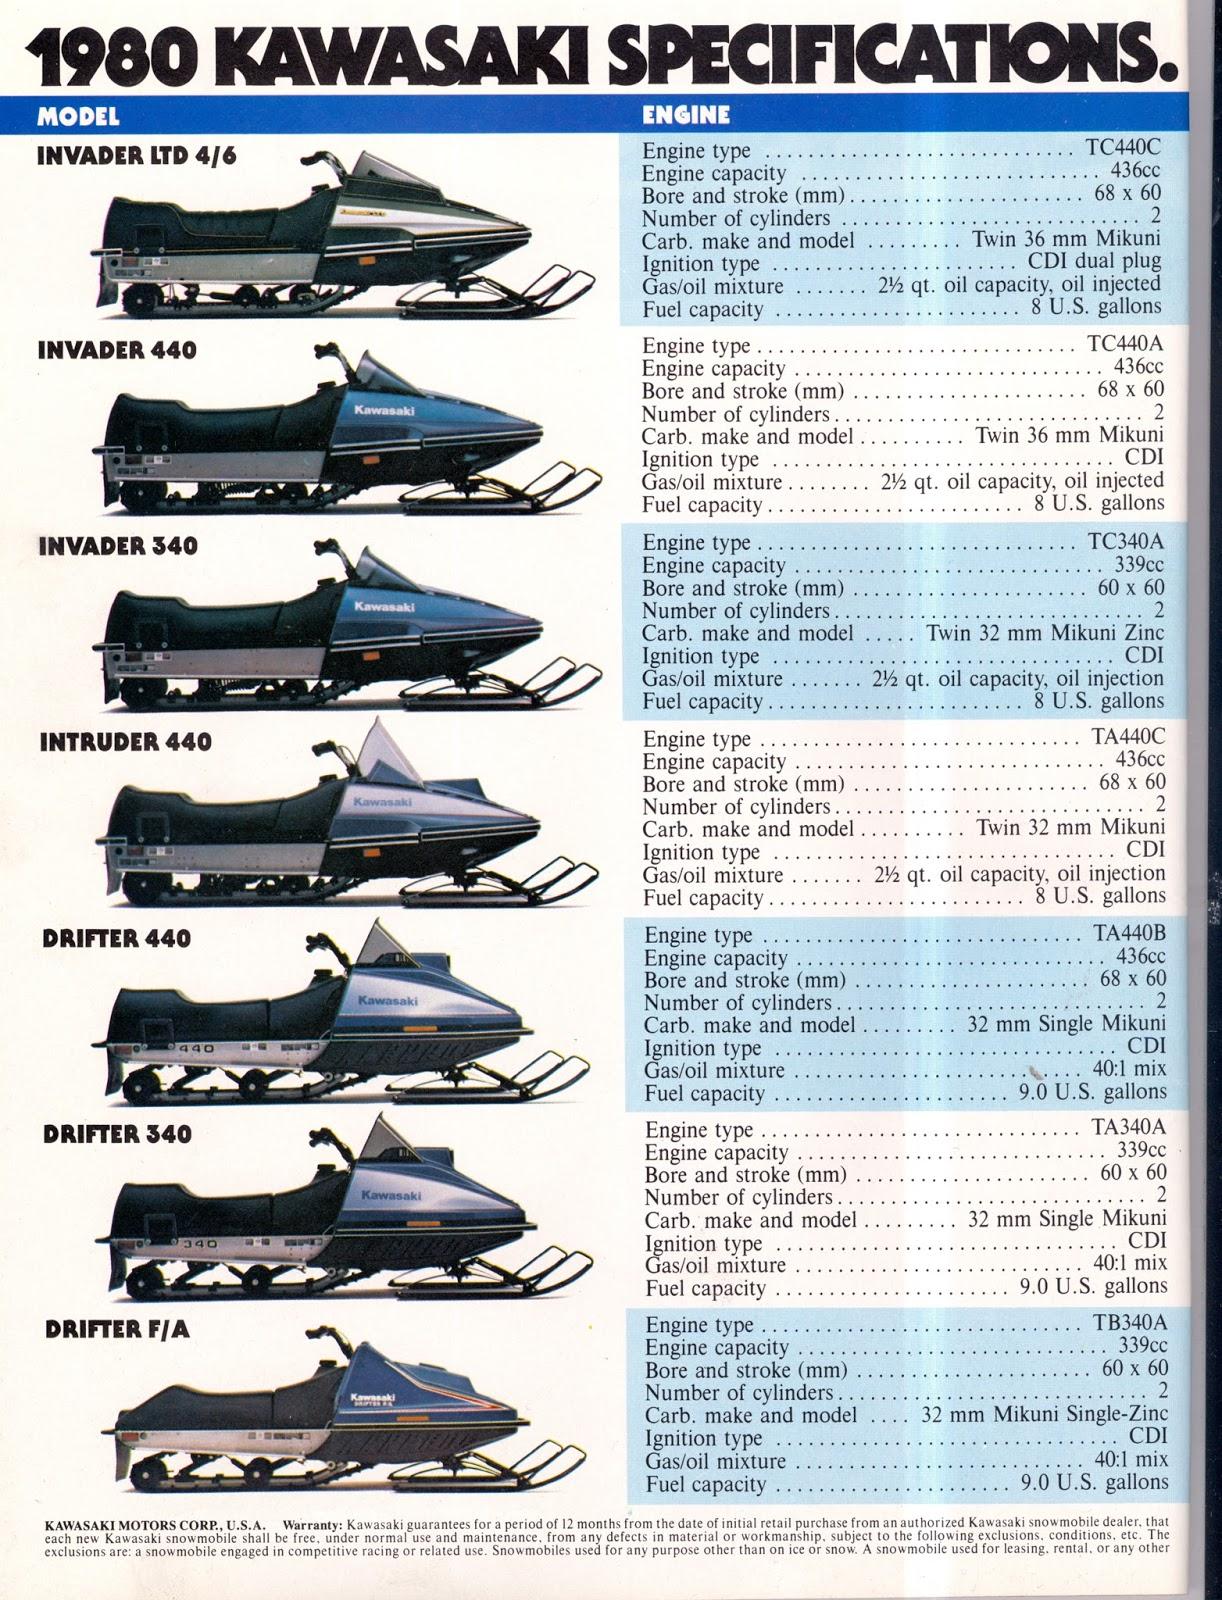 CLASSIC SNOWMOBILES OF THE PAST: 1980 KAWASAKI SNOWMOBILE ENGINE